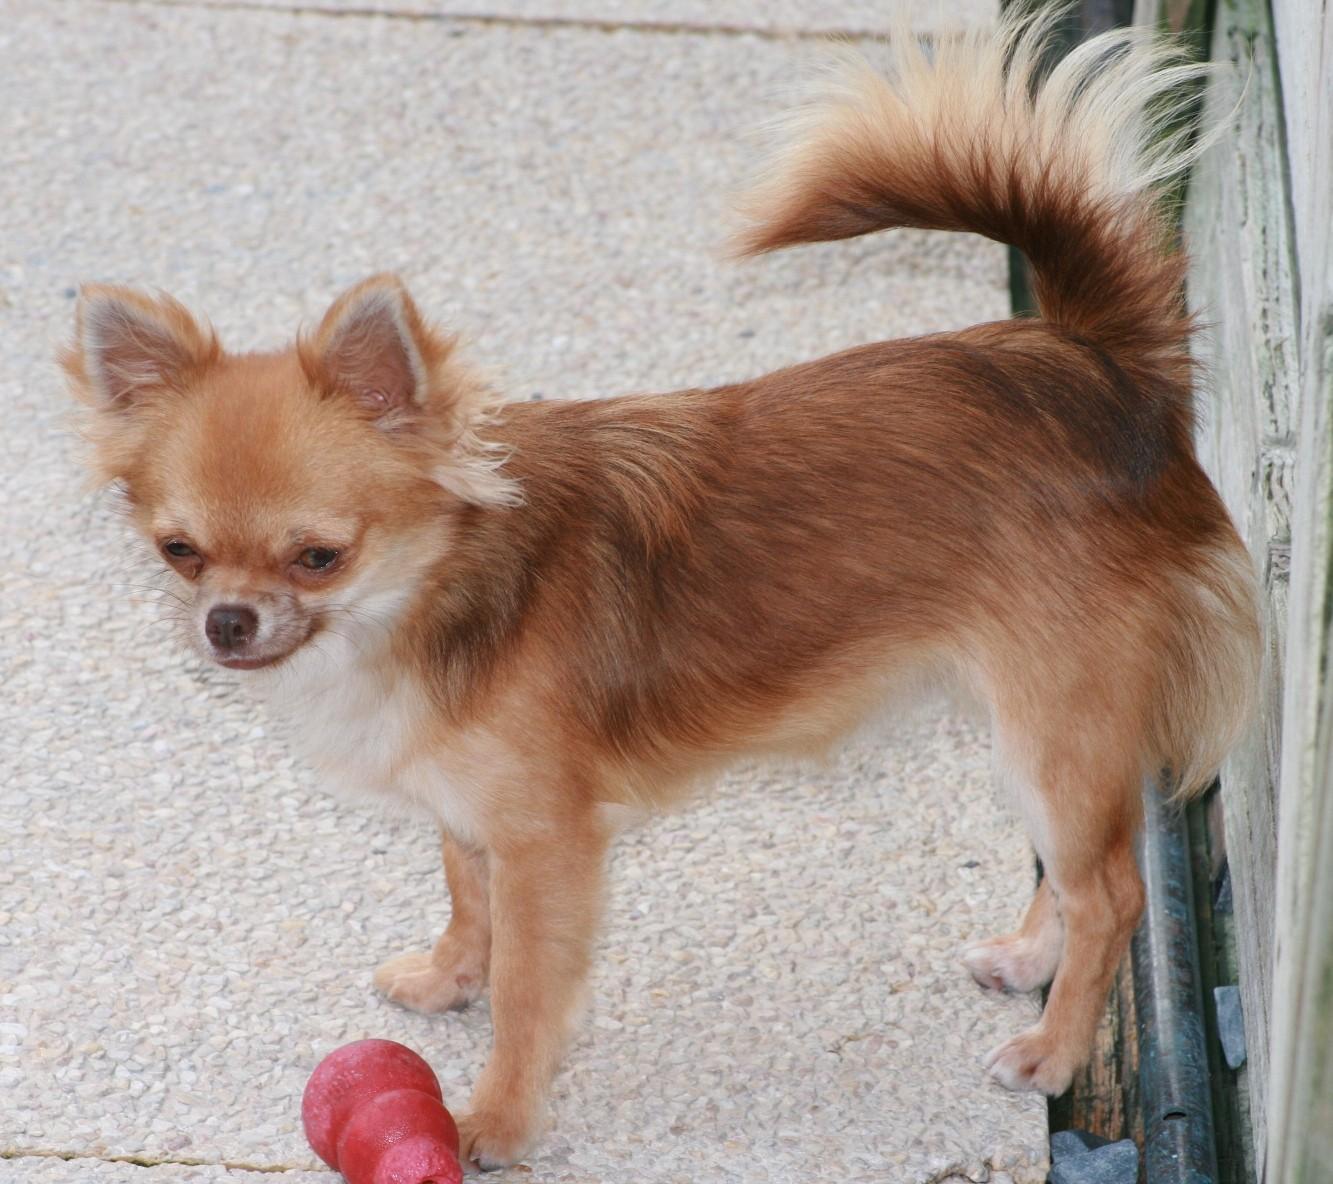 Chihuahua - Mi-choco des lutins malins